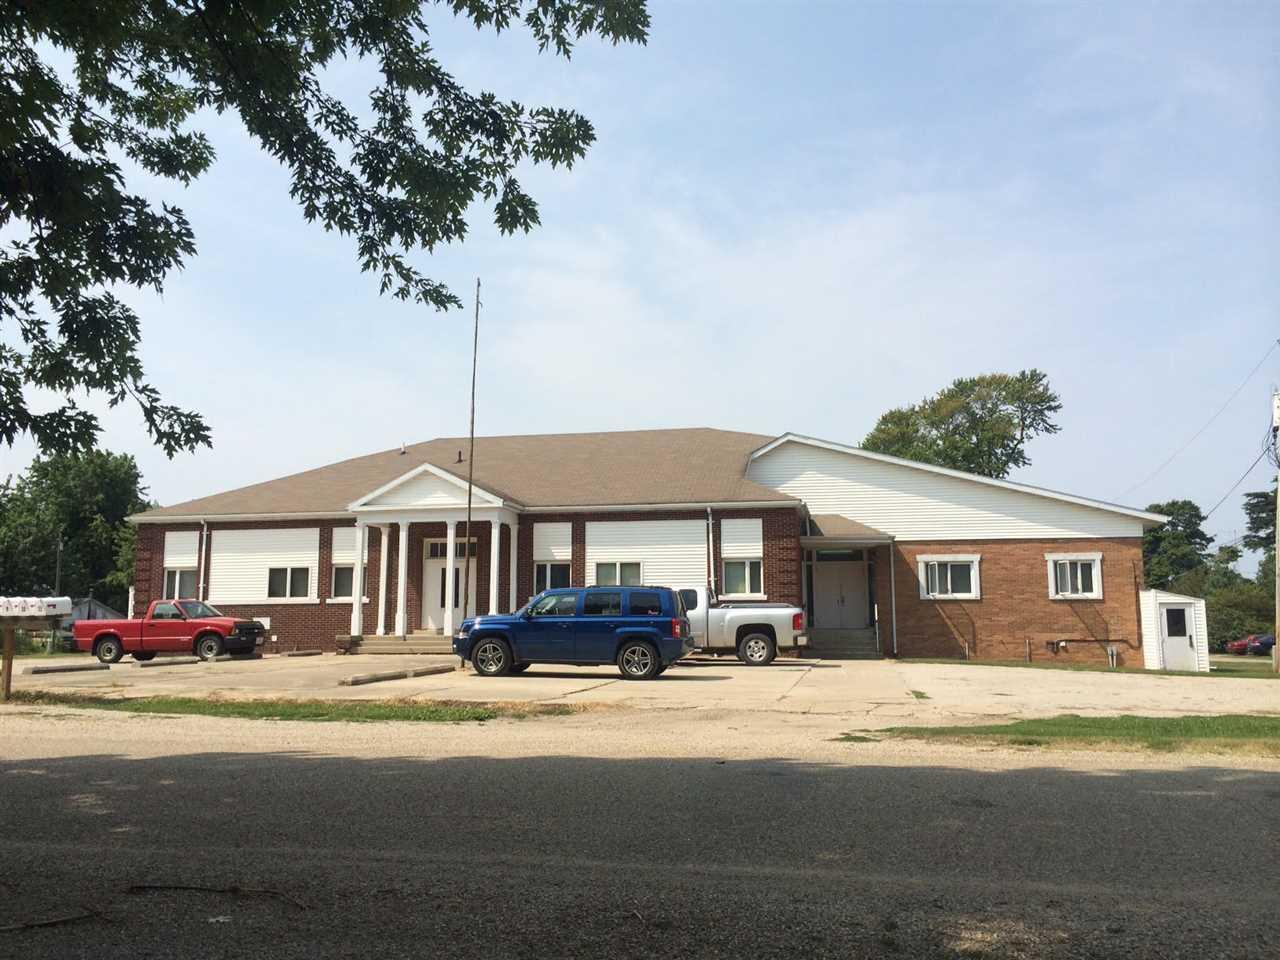 Real Estate for Sale, ListingId: 35128502, Hartsburg,IL62643